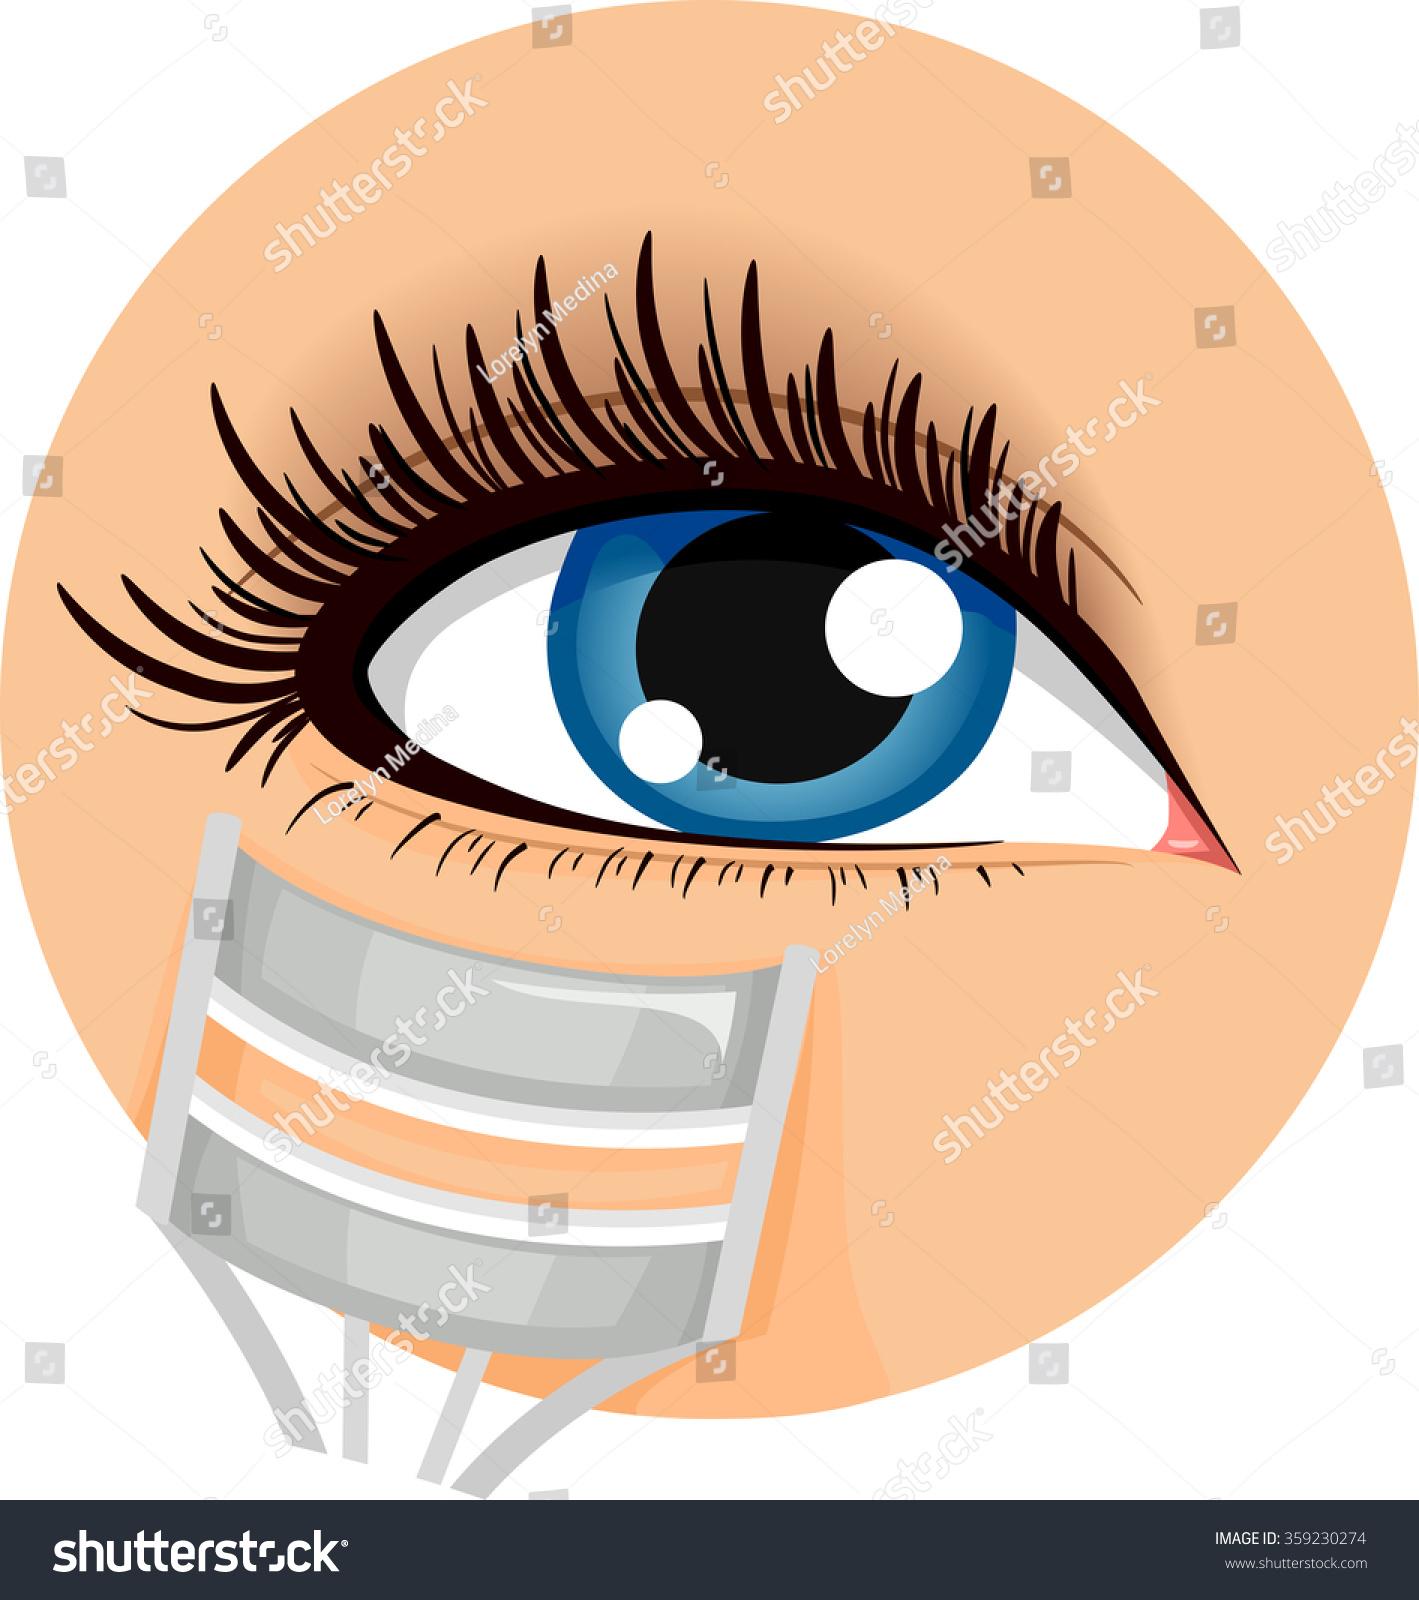 Illustration Icon Demonstrating How Use Eyelash Stock Vector